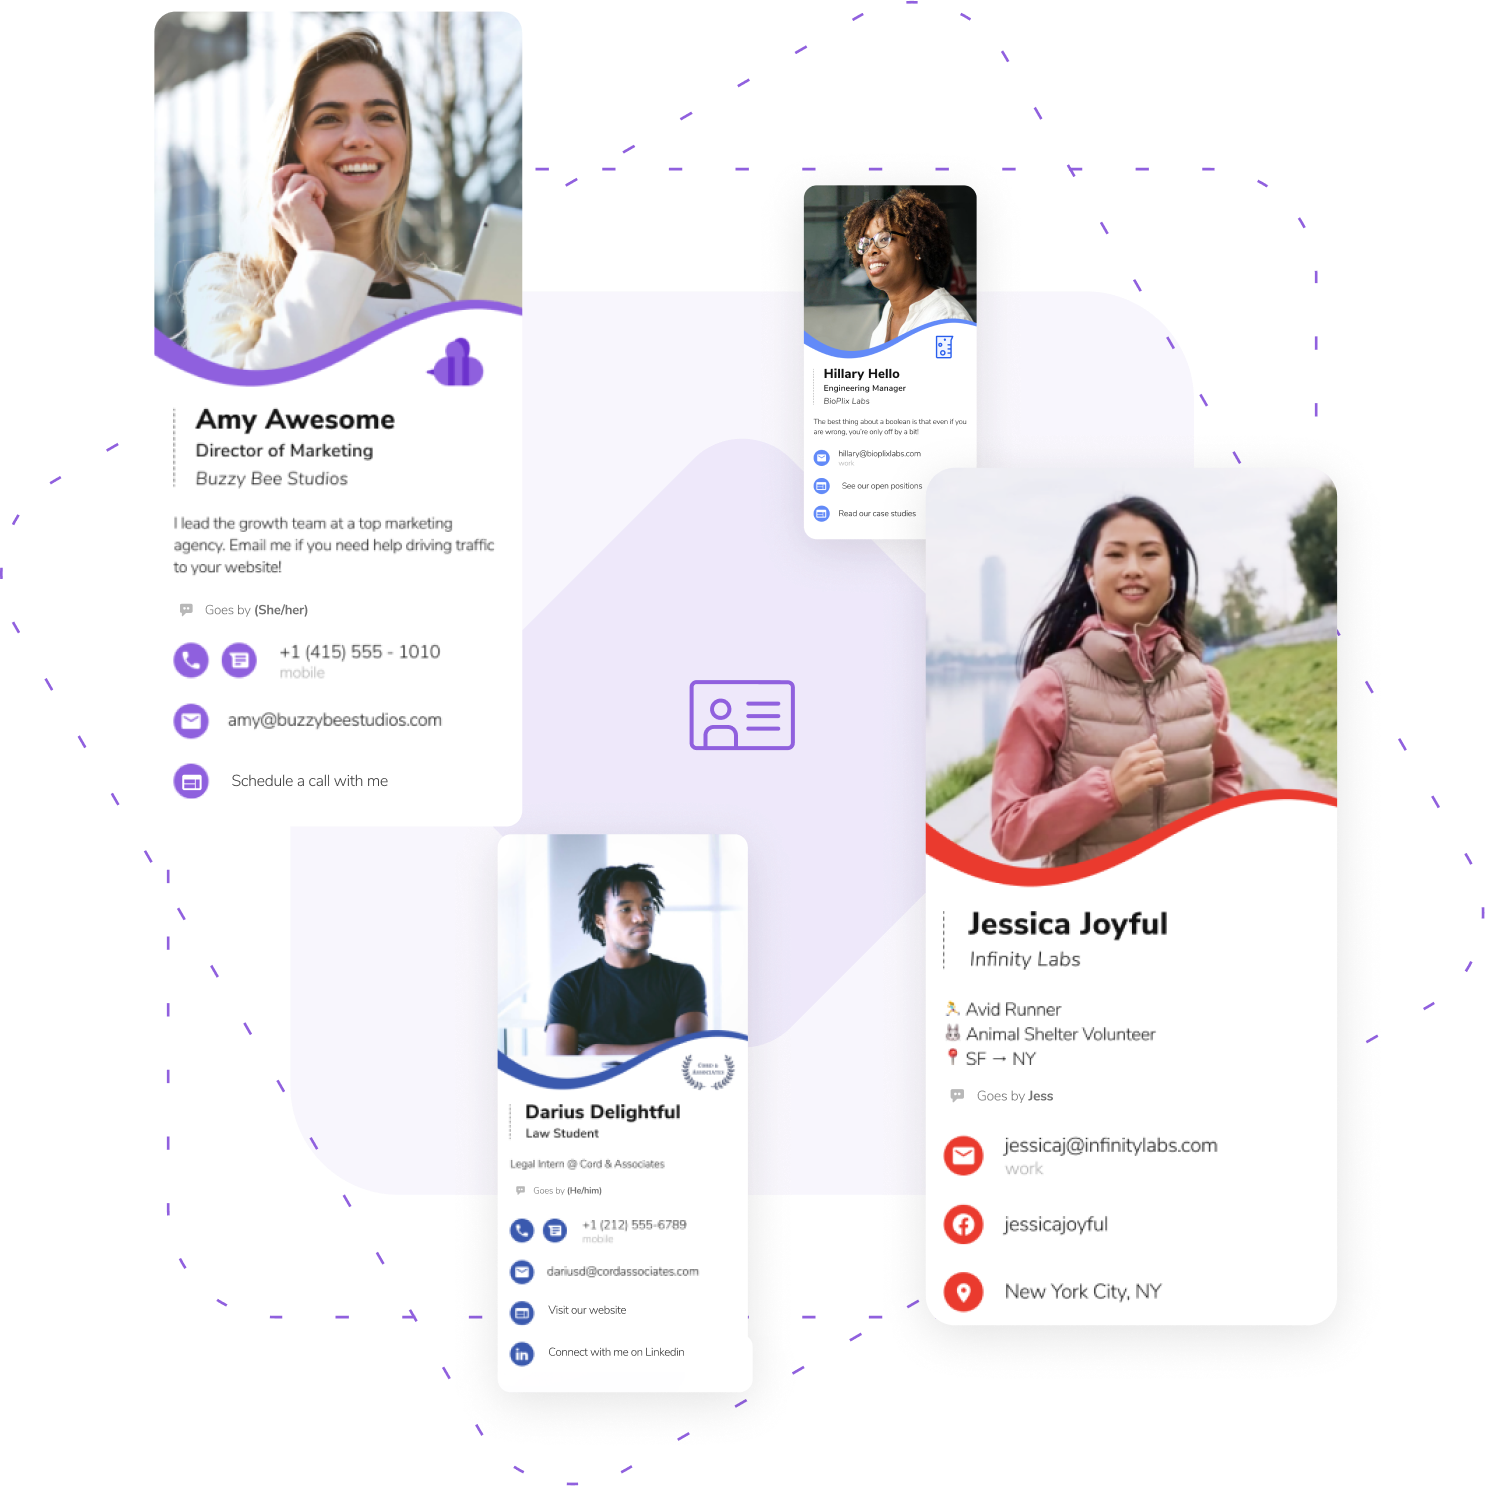 HiHello customizable digital business cards